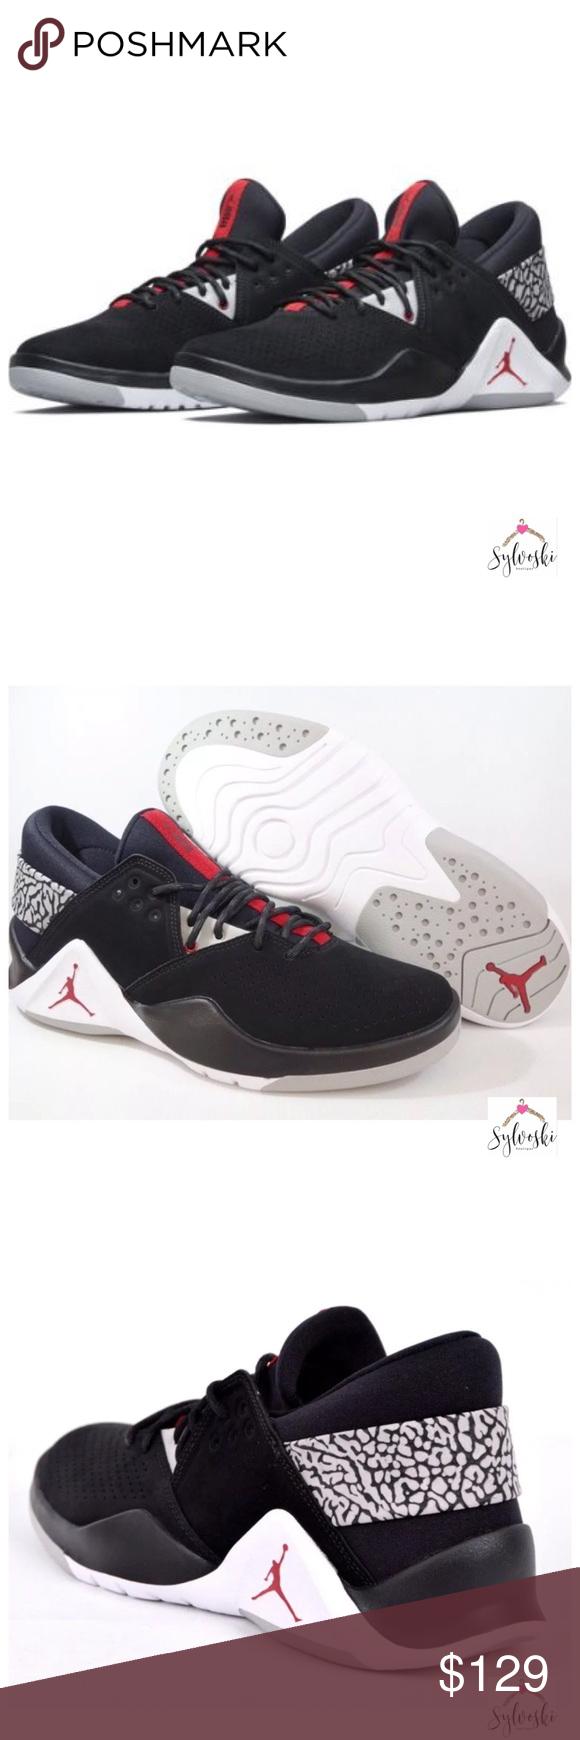 d8b1c5639390 Nike Jordan Flight Fresh PREM Low JORDAN FLIGHT FRESH PREM BLACK GYM RED-